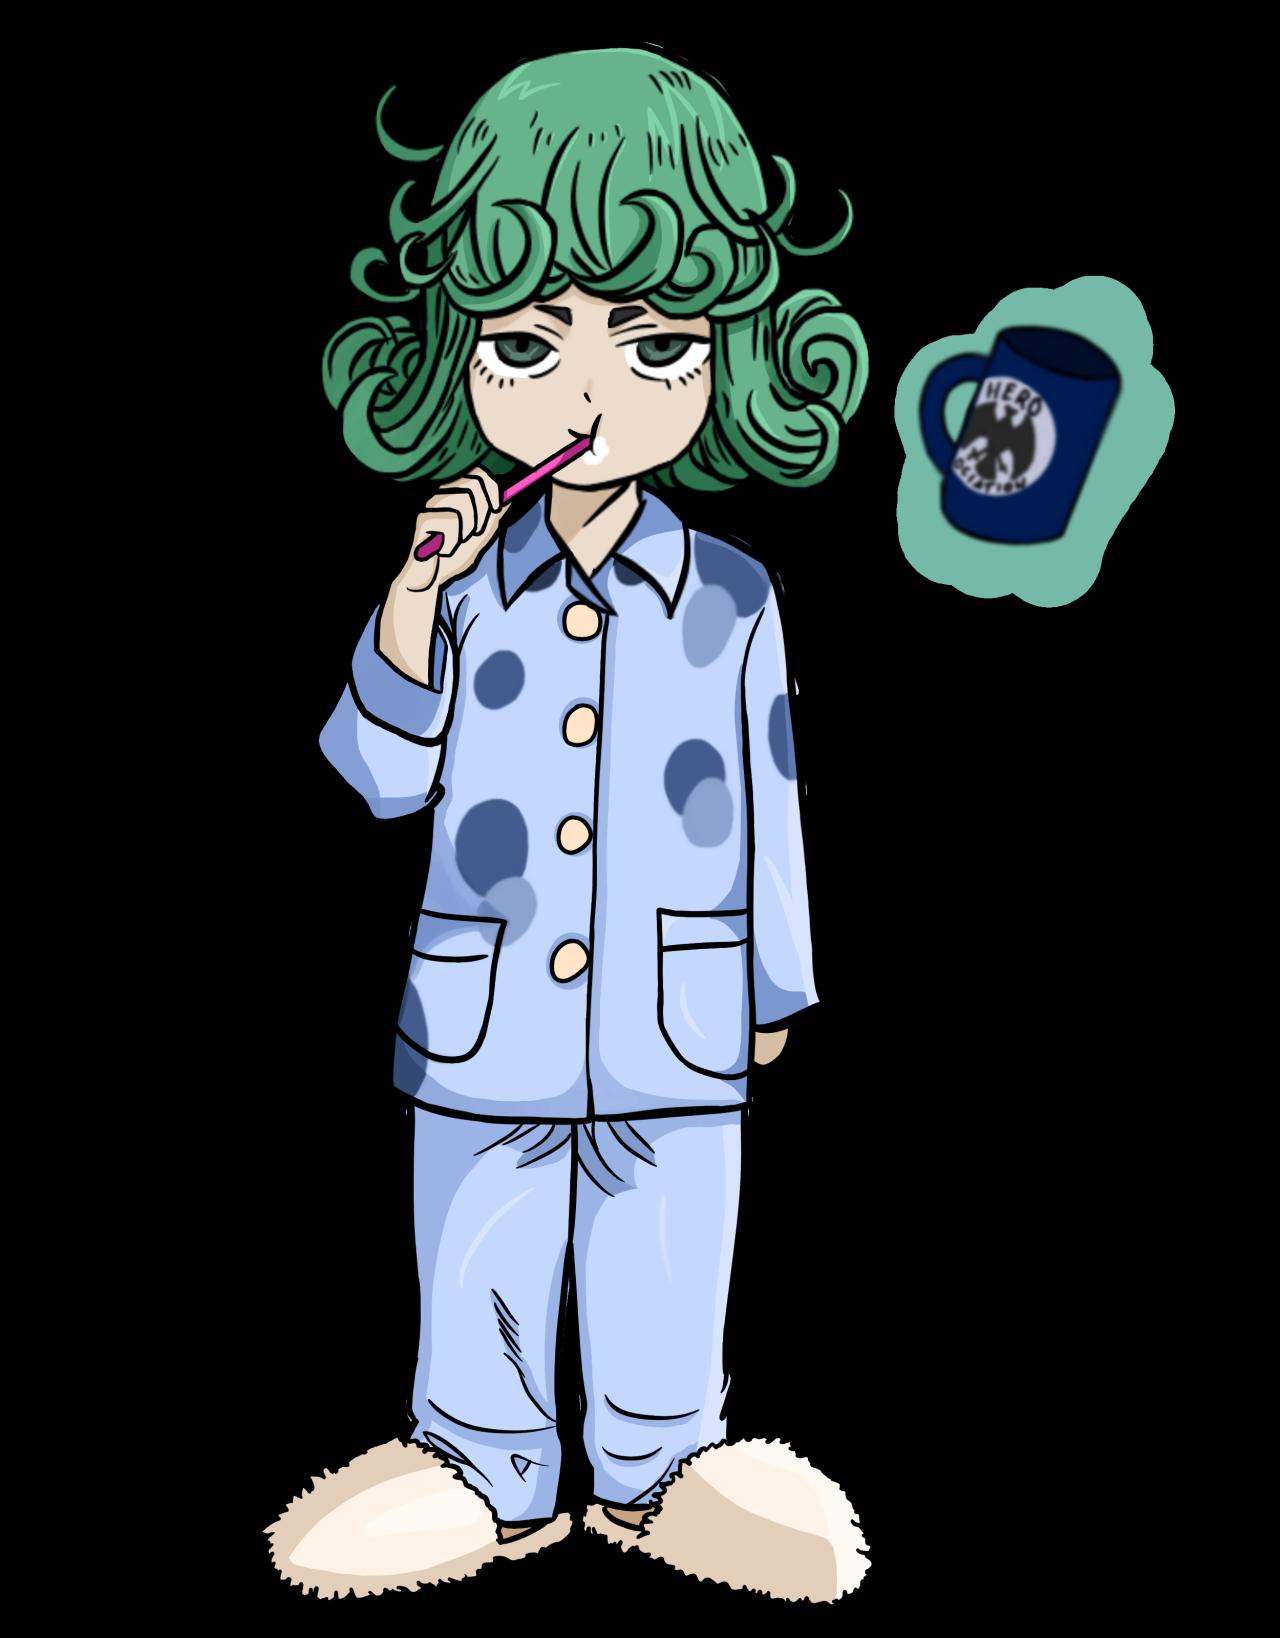 Rowan adorable pjs tatsumaki. Pajamas clipart boy